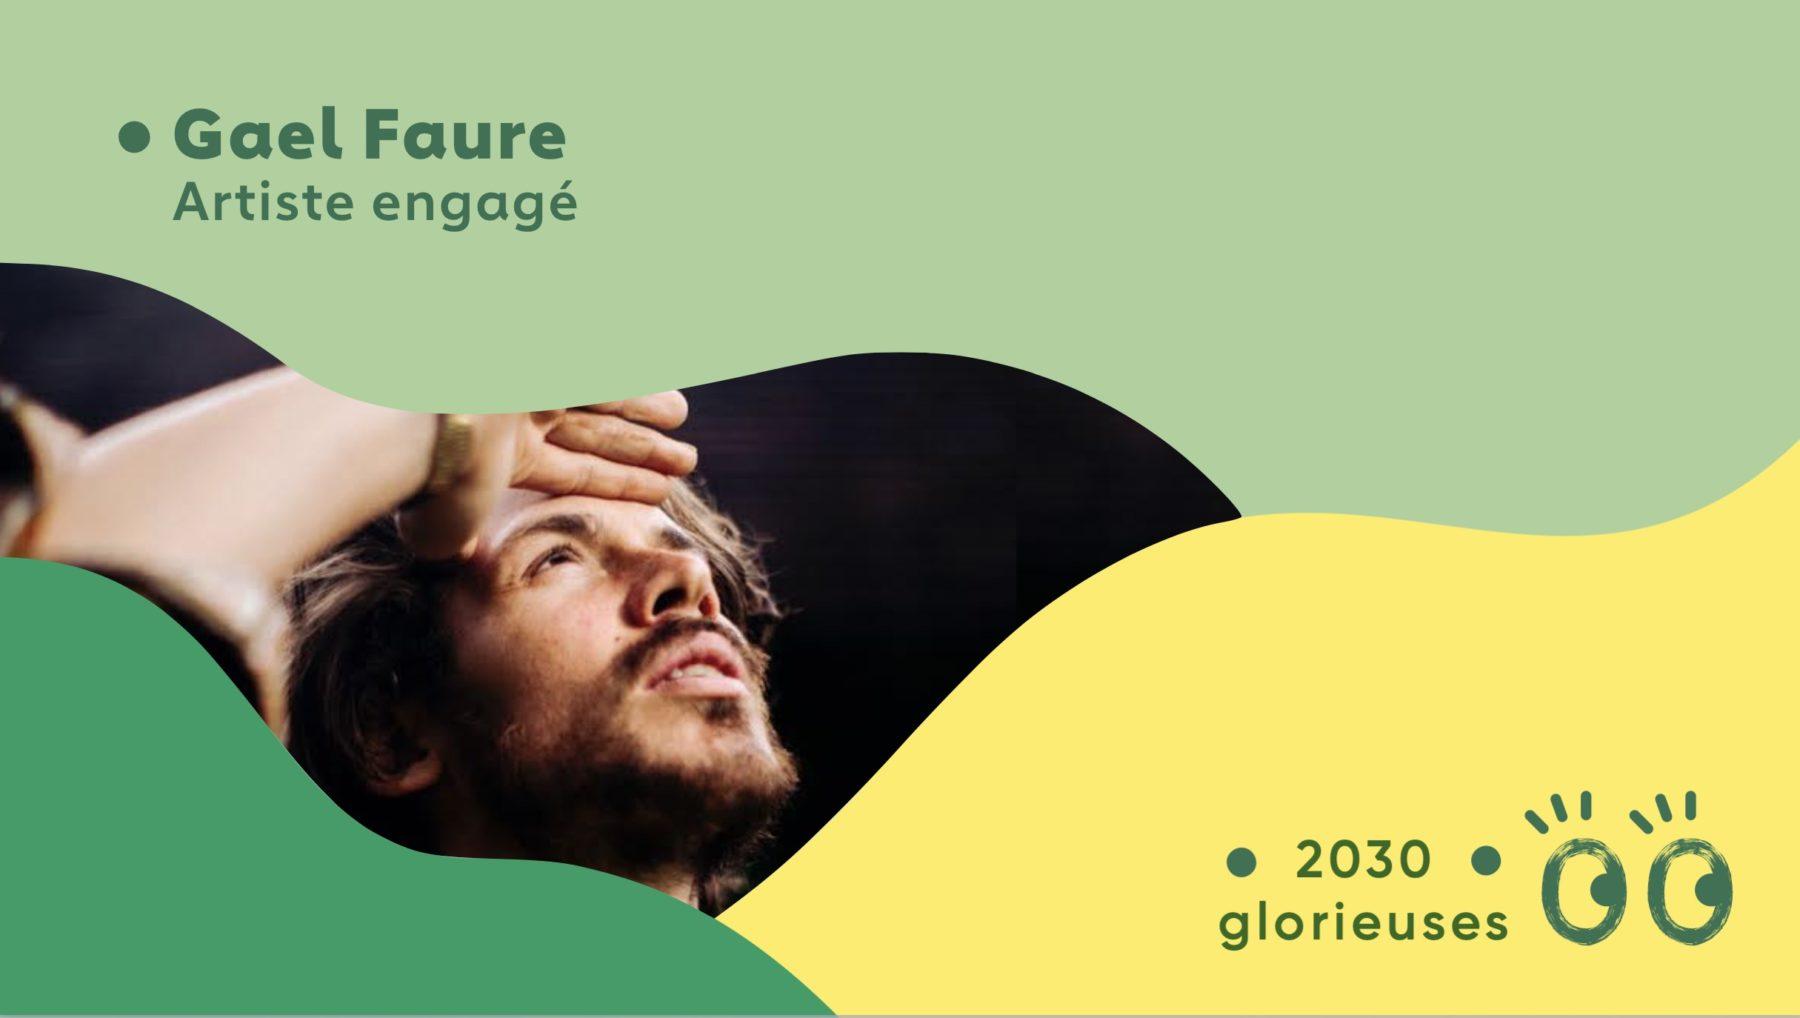 2030 Glorieuses #2: Gael Faure